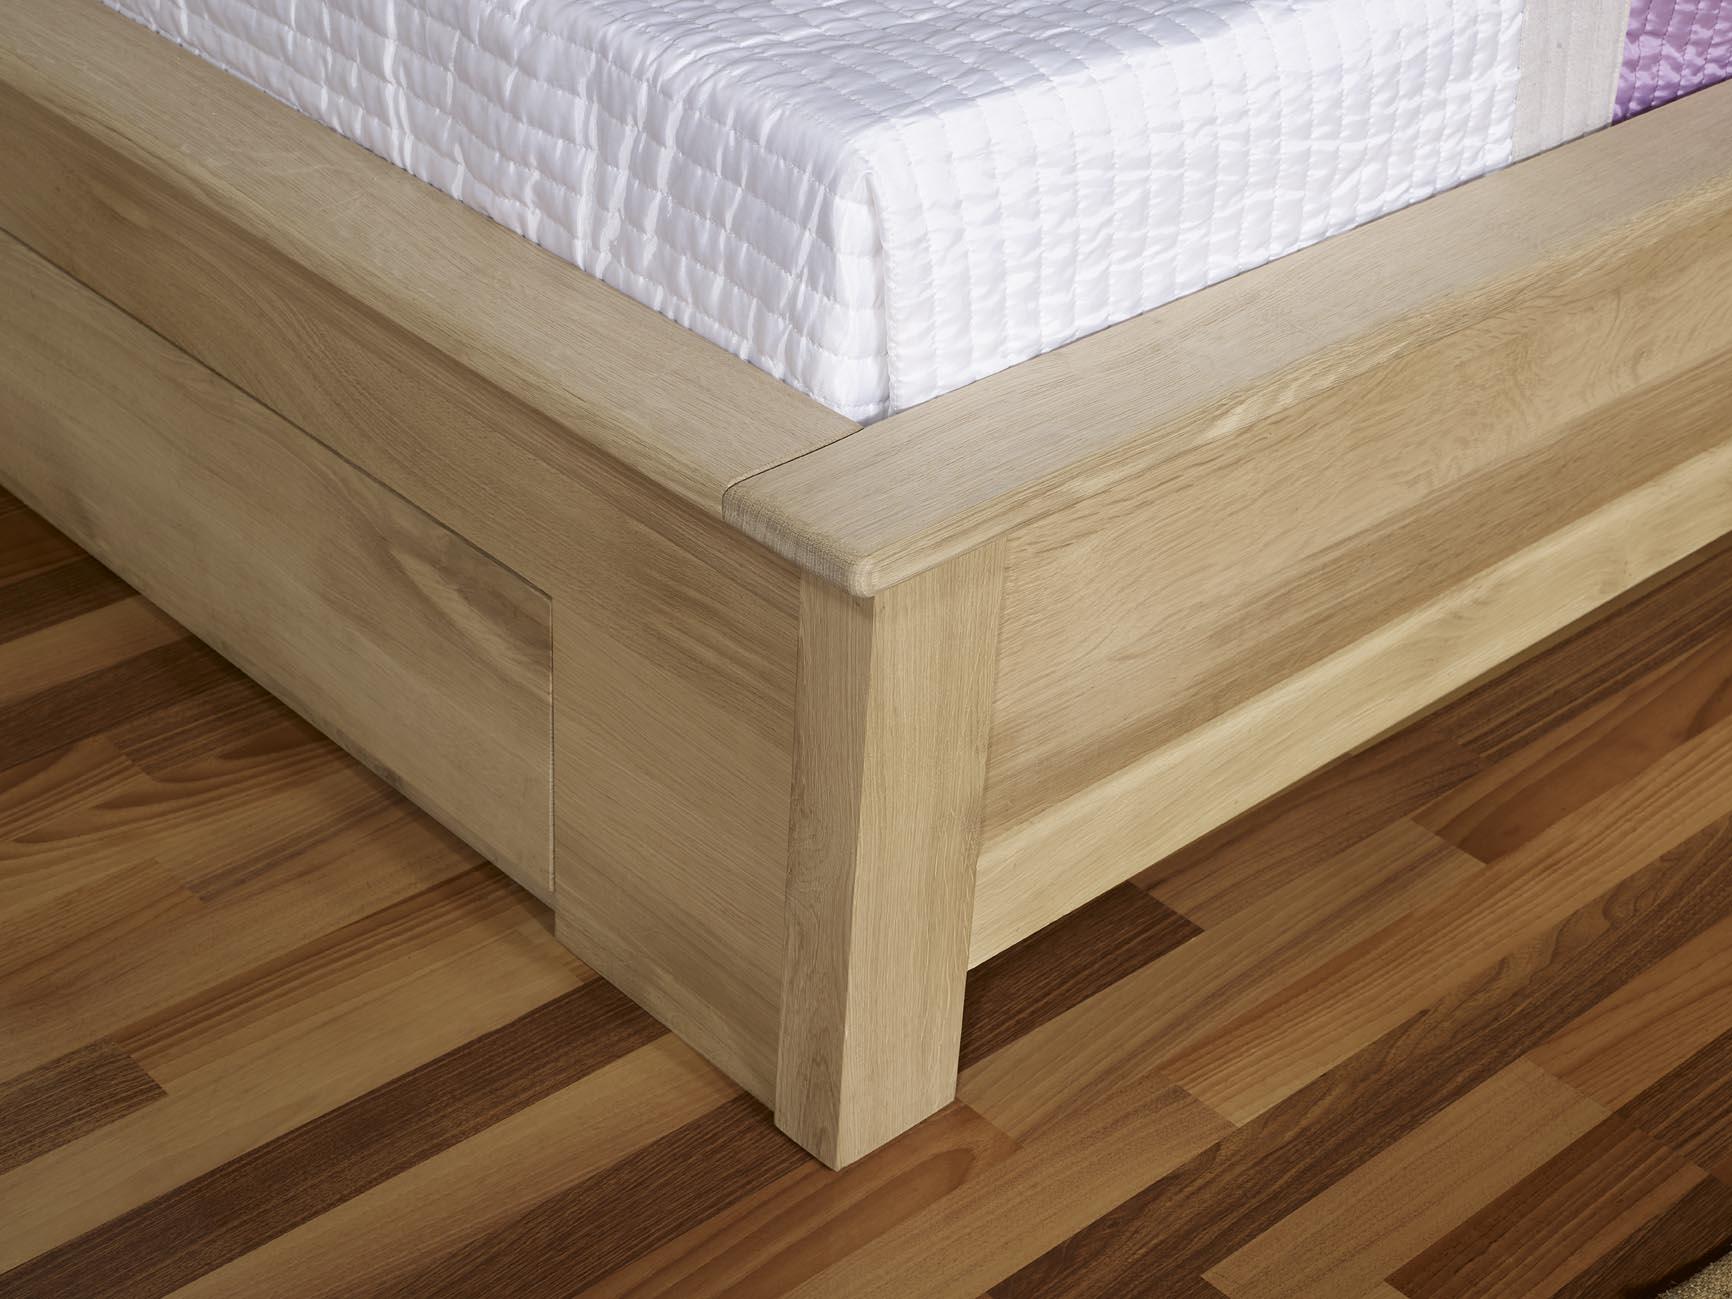 lit collection nature 160 200 en ch ne massif avec tiroirs finition ch ne bross meuble en. Black Bedroom Furniture Sets. Home Design Ideas